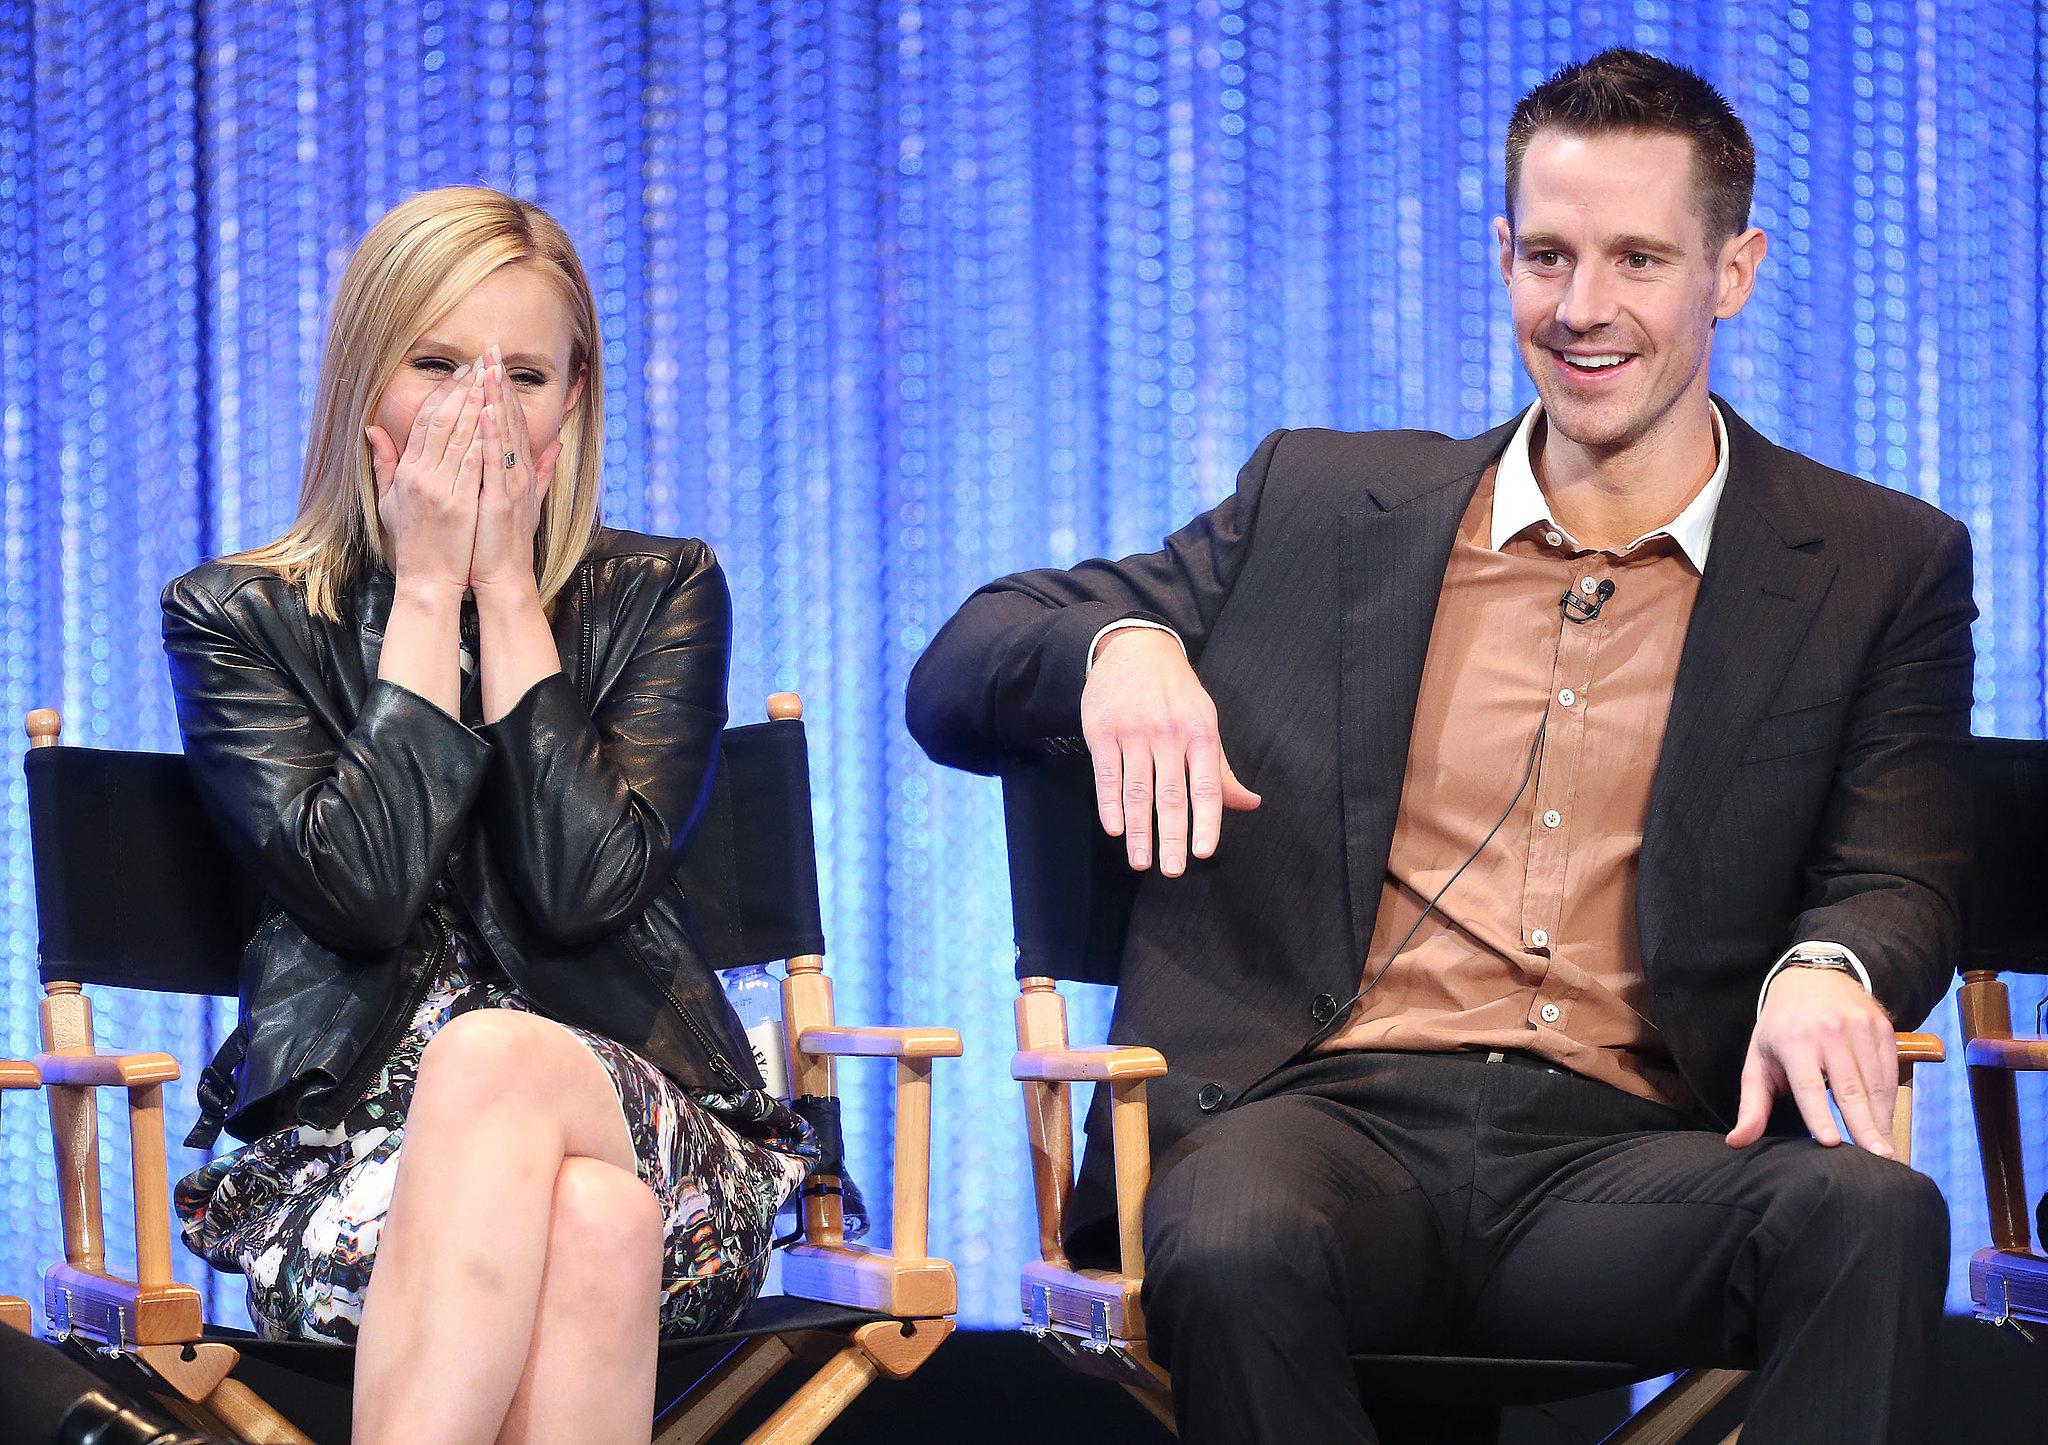 Jason Dohring sat next to a giggly Kristen Bell.